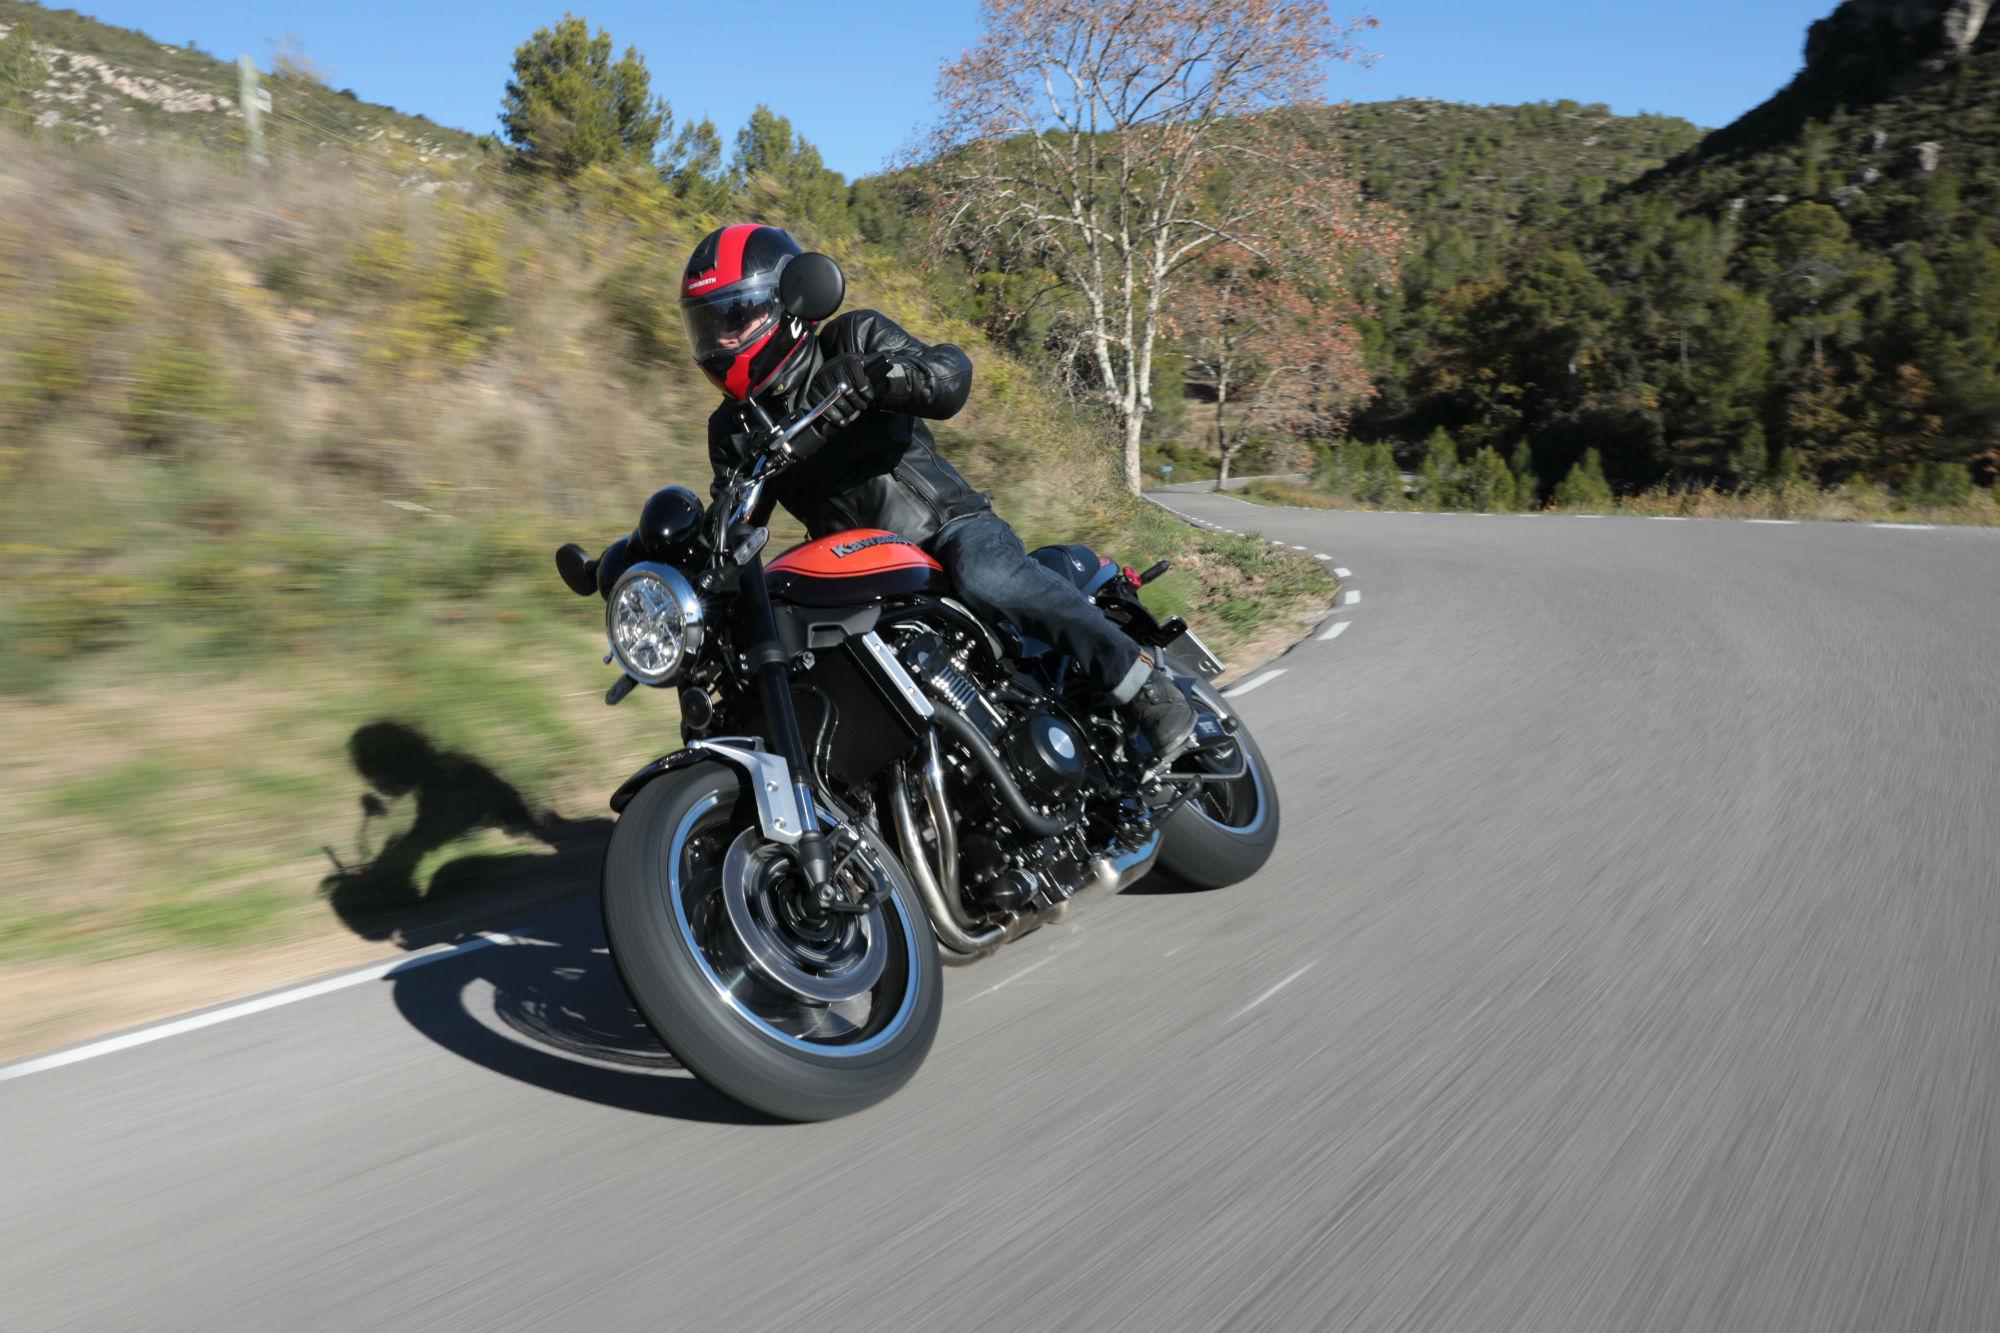 First Ride Kawasaki Z900rs Review Visordown